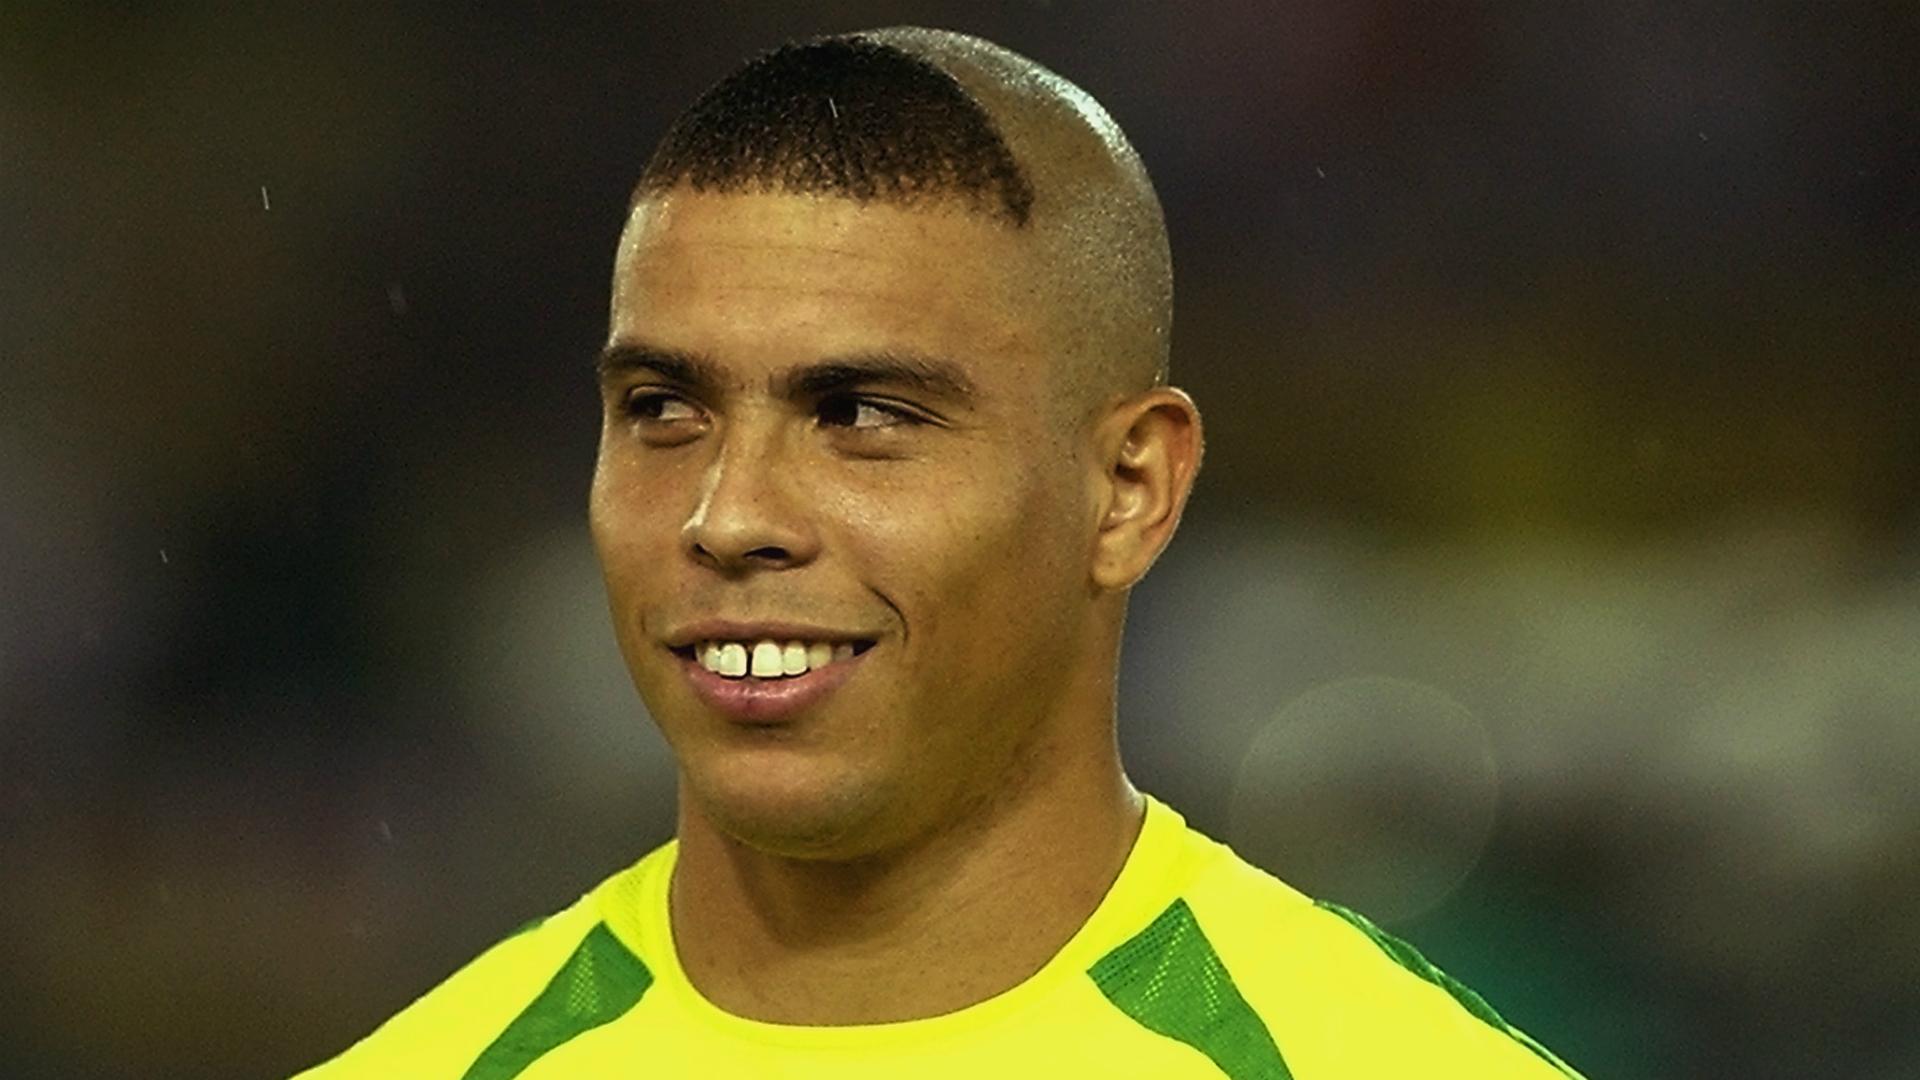 Ronaldo Brazil Legend Reveals Reason Behind Famous 2002 World Cup